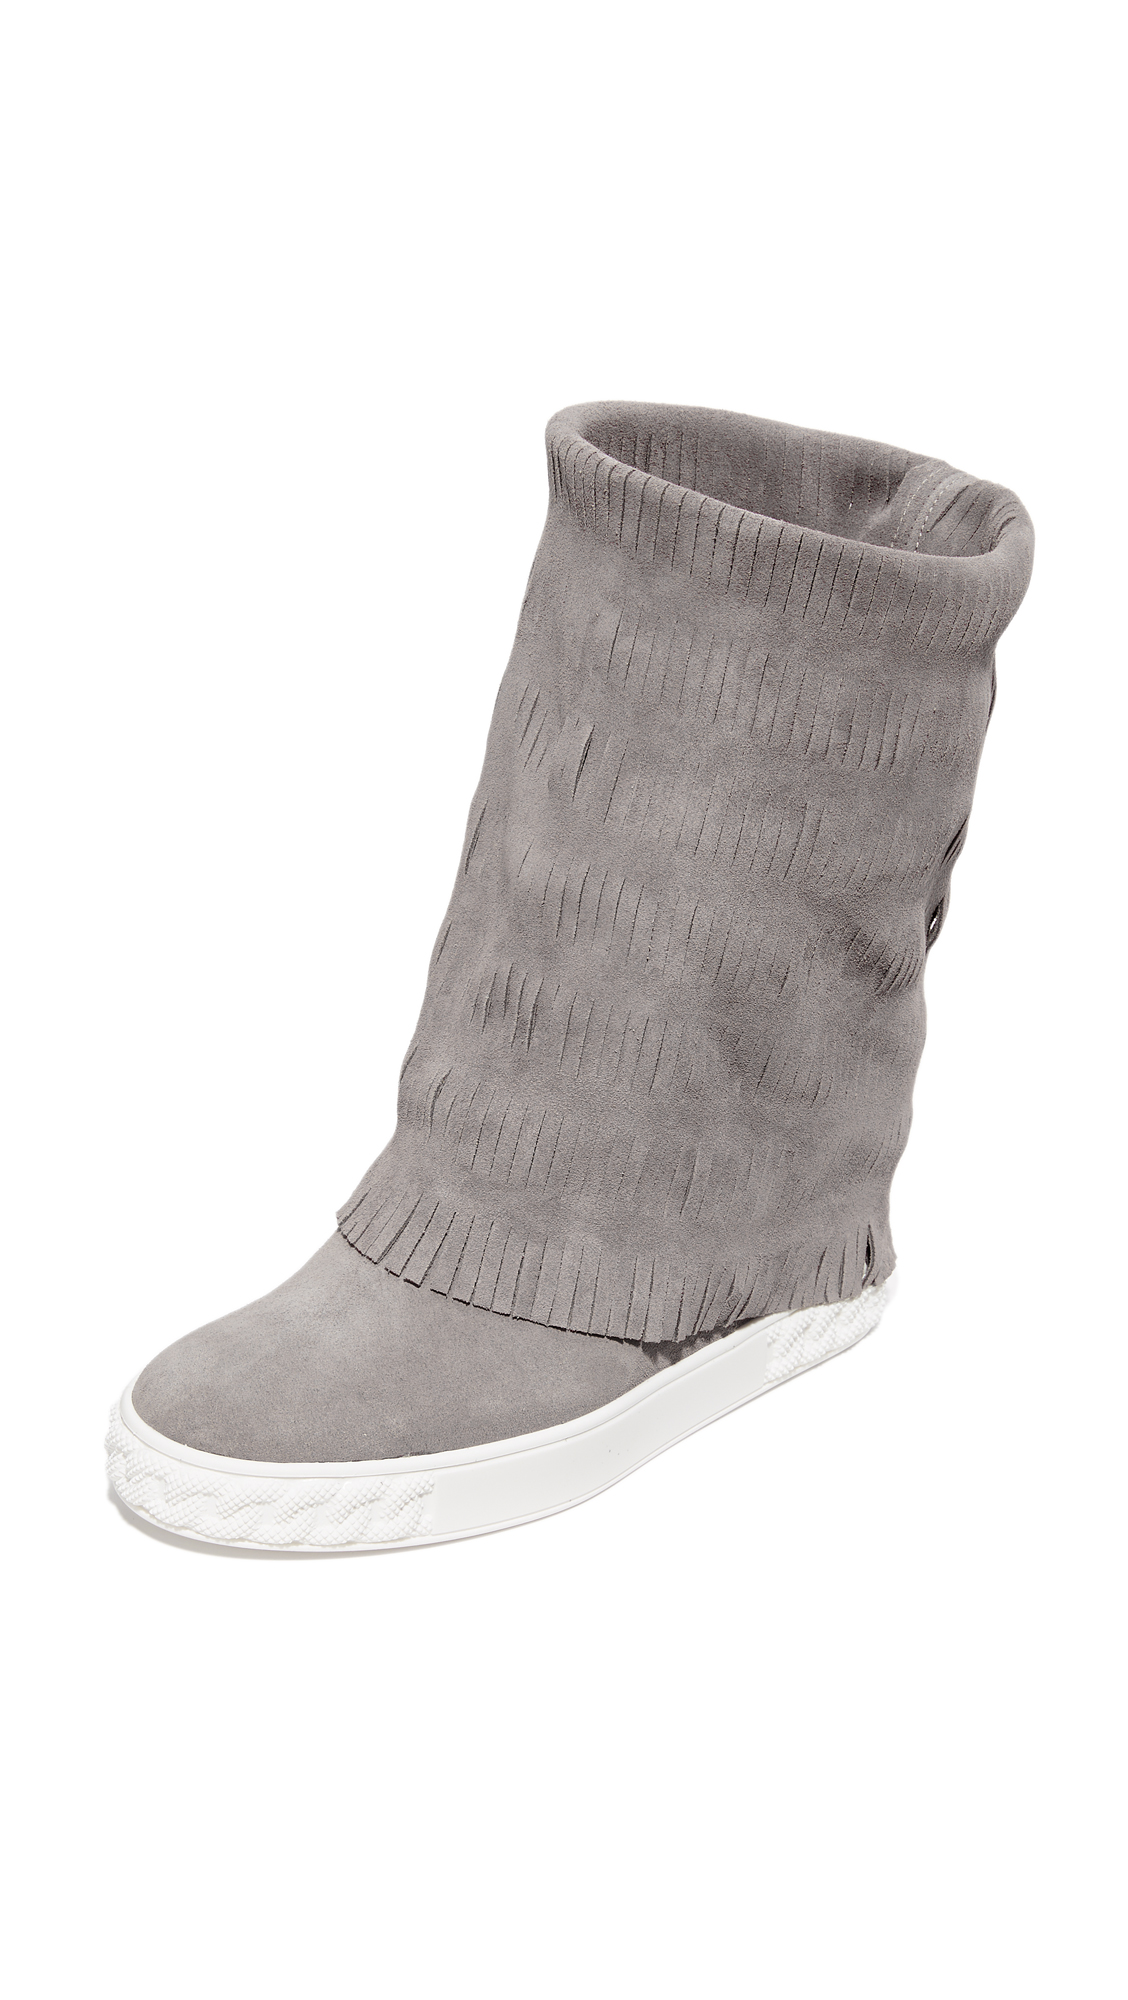 Casadei Fringe Ankle Boots - Grey at Shopbop